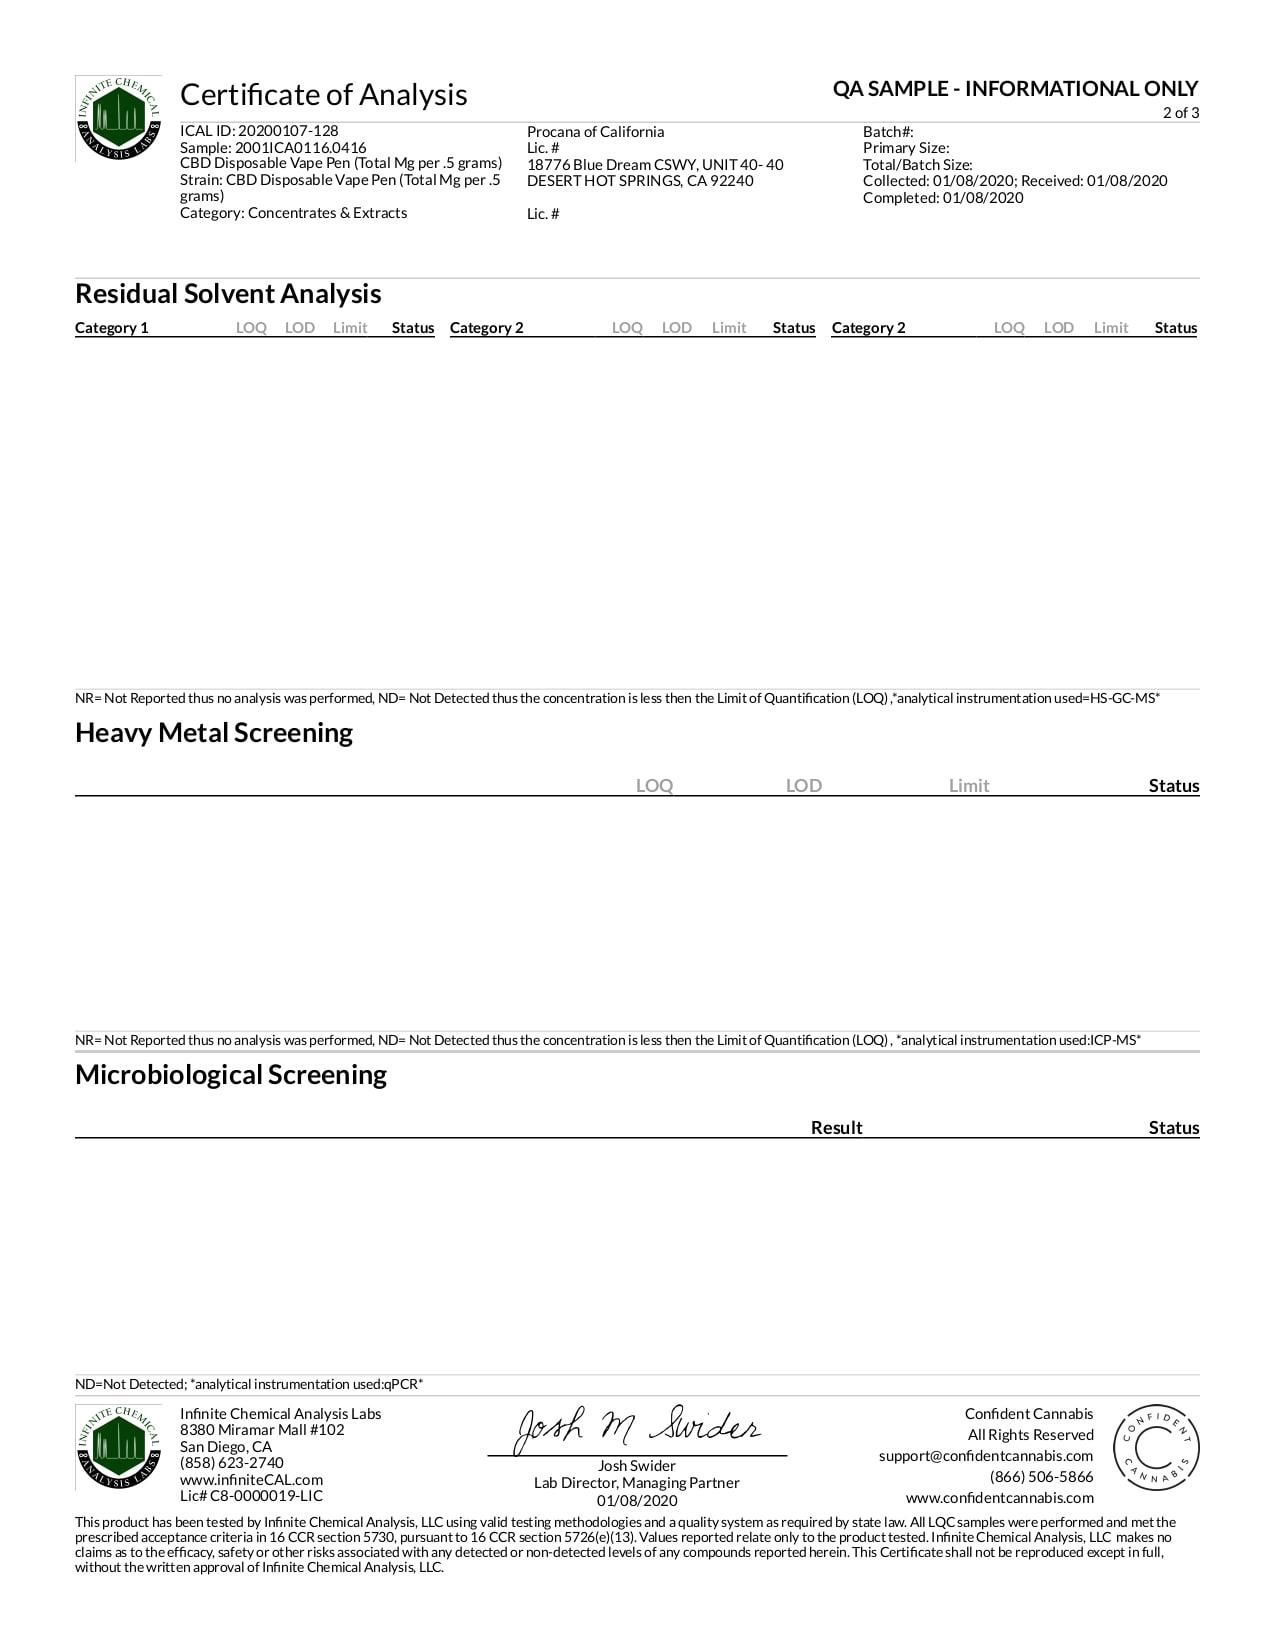 Procana CBD Disposable Vaporizer Lab Report Fresh Menthol 200mg